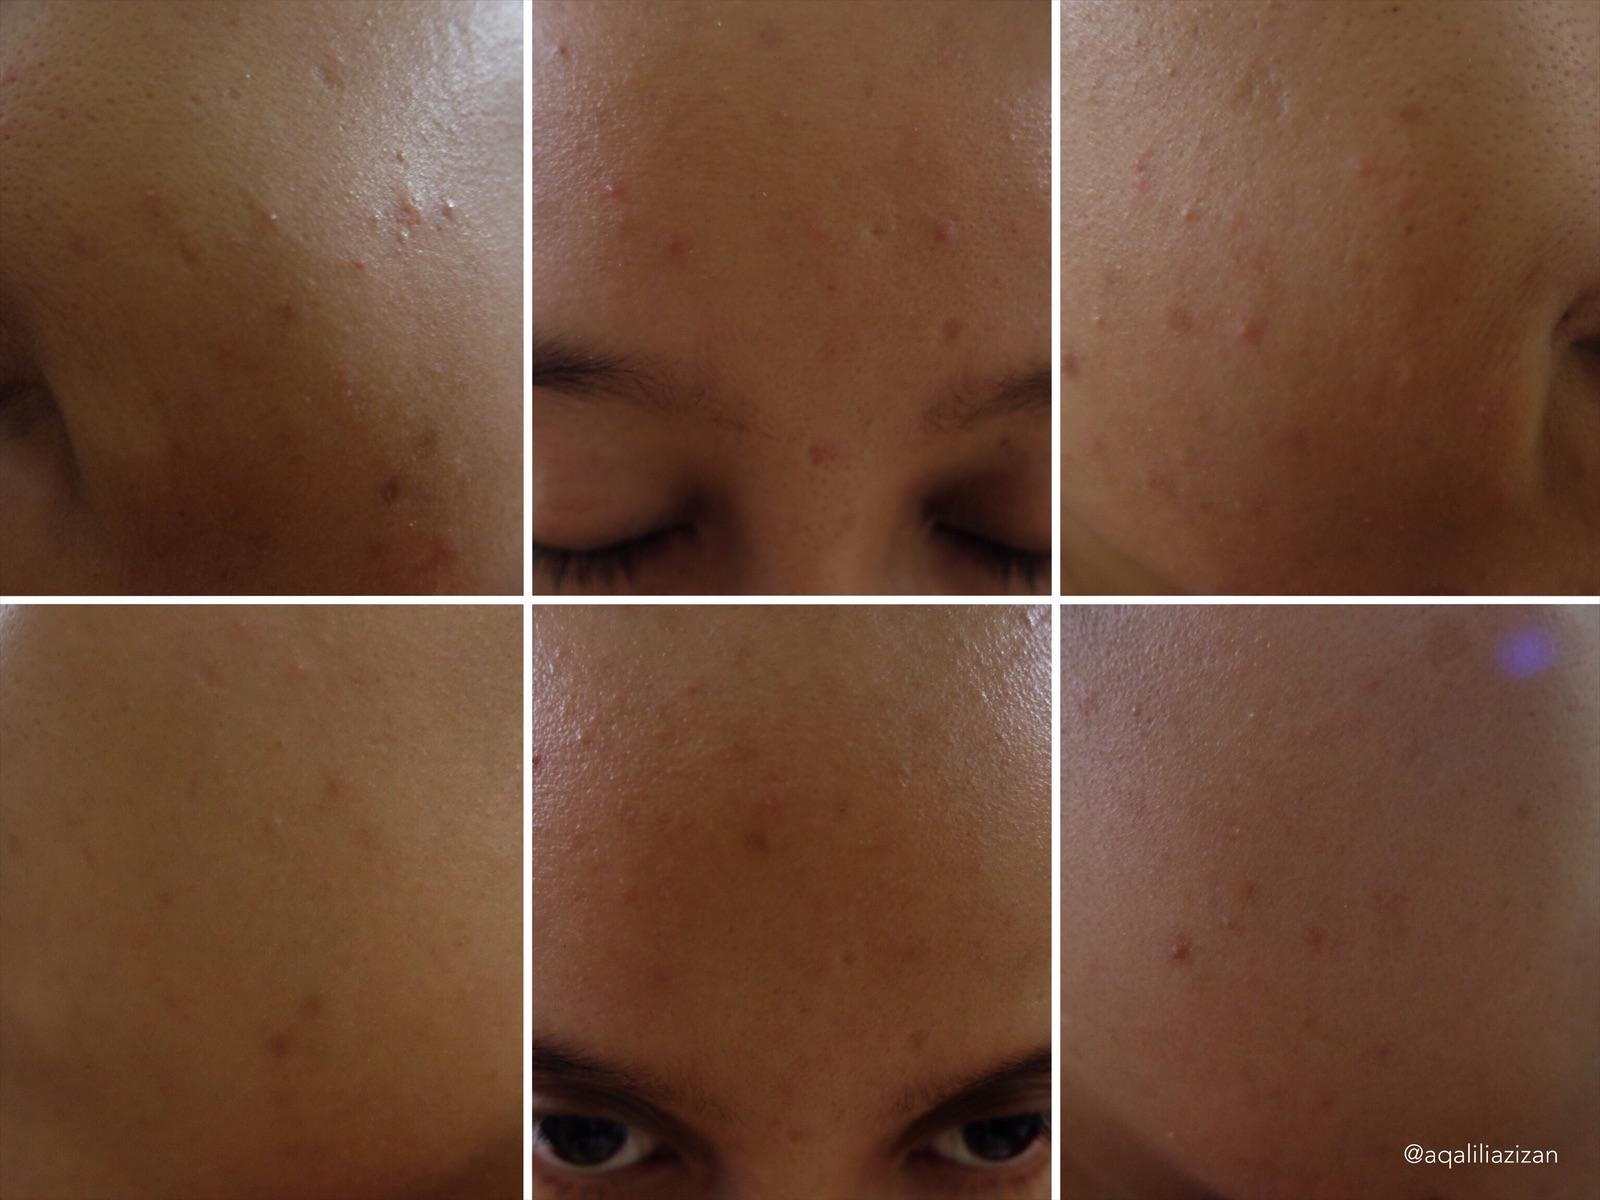 SPRIN-KLES Refreshing pH Balancing Face Toner & Mist Curitan Aqalili